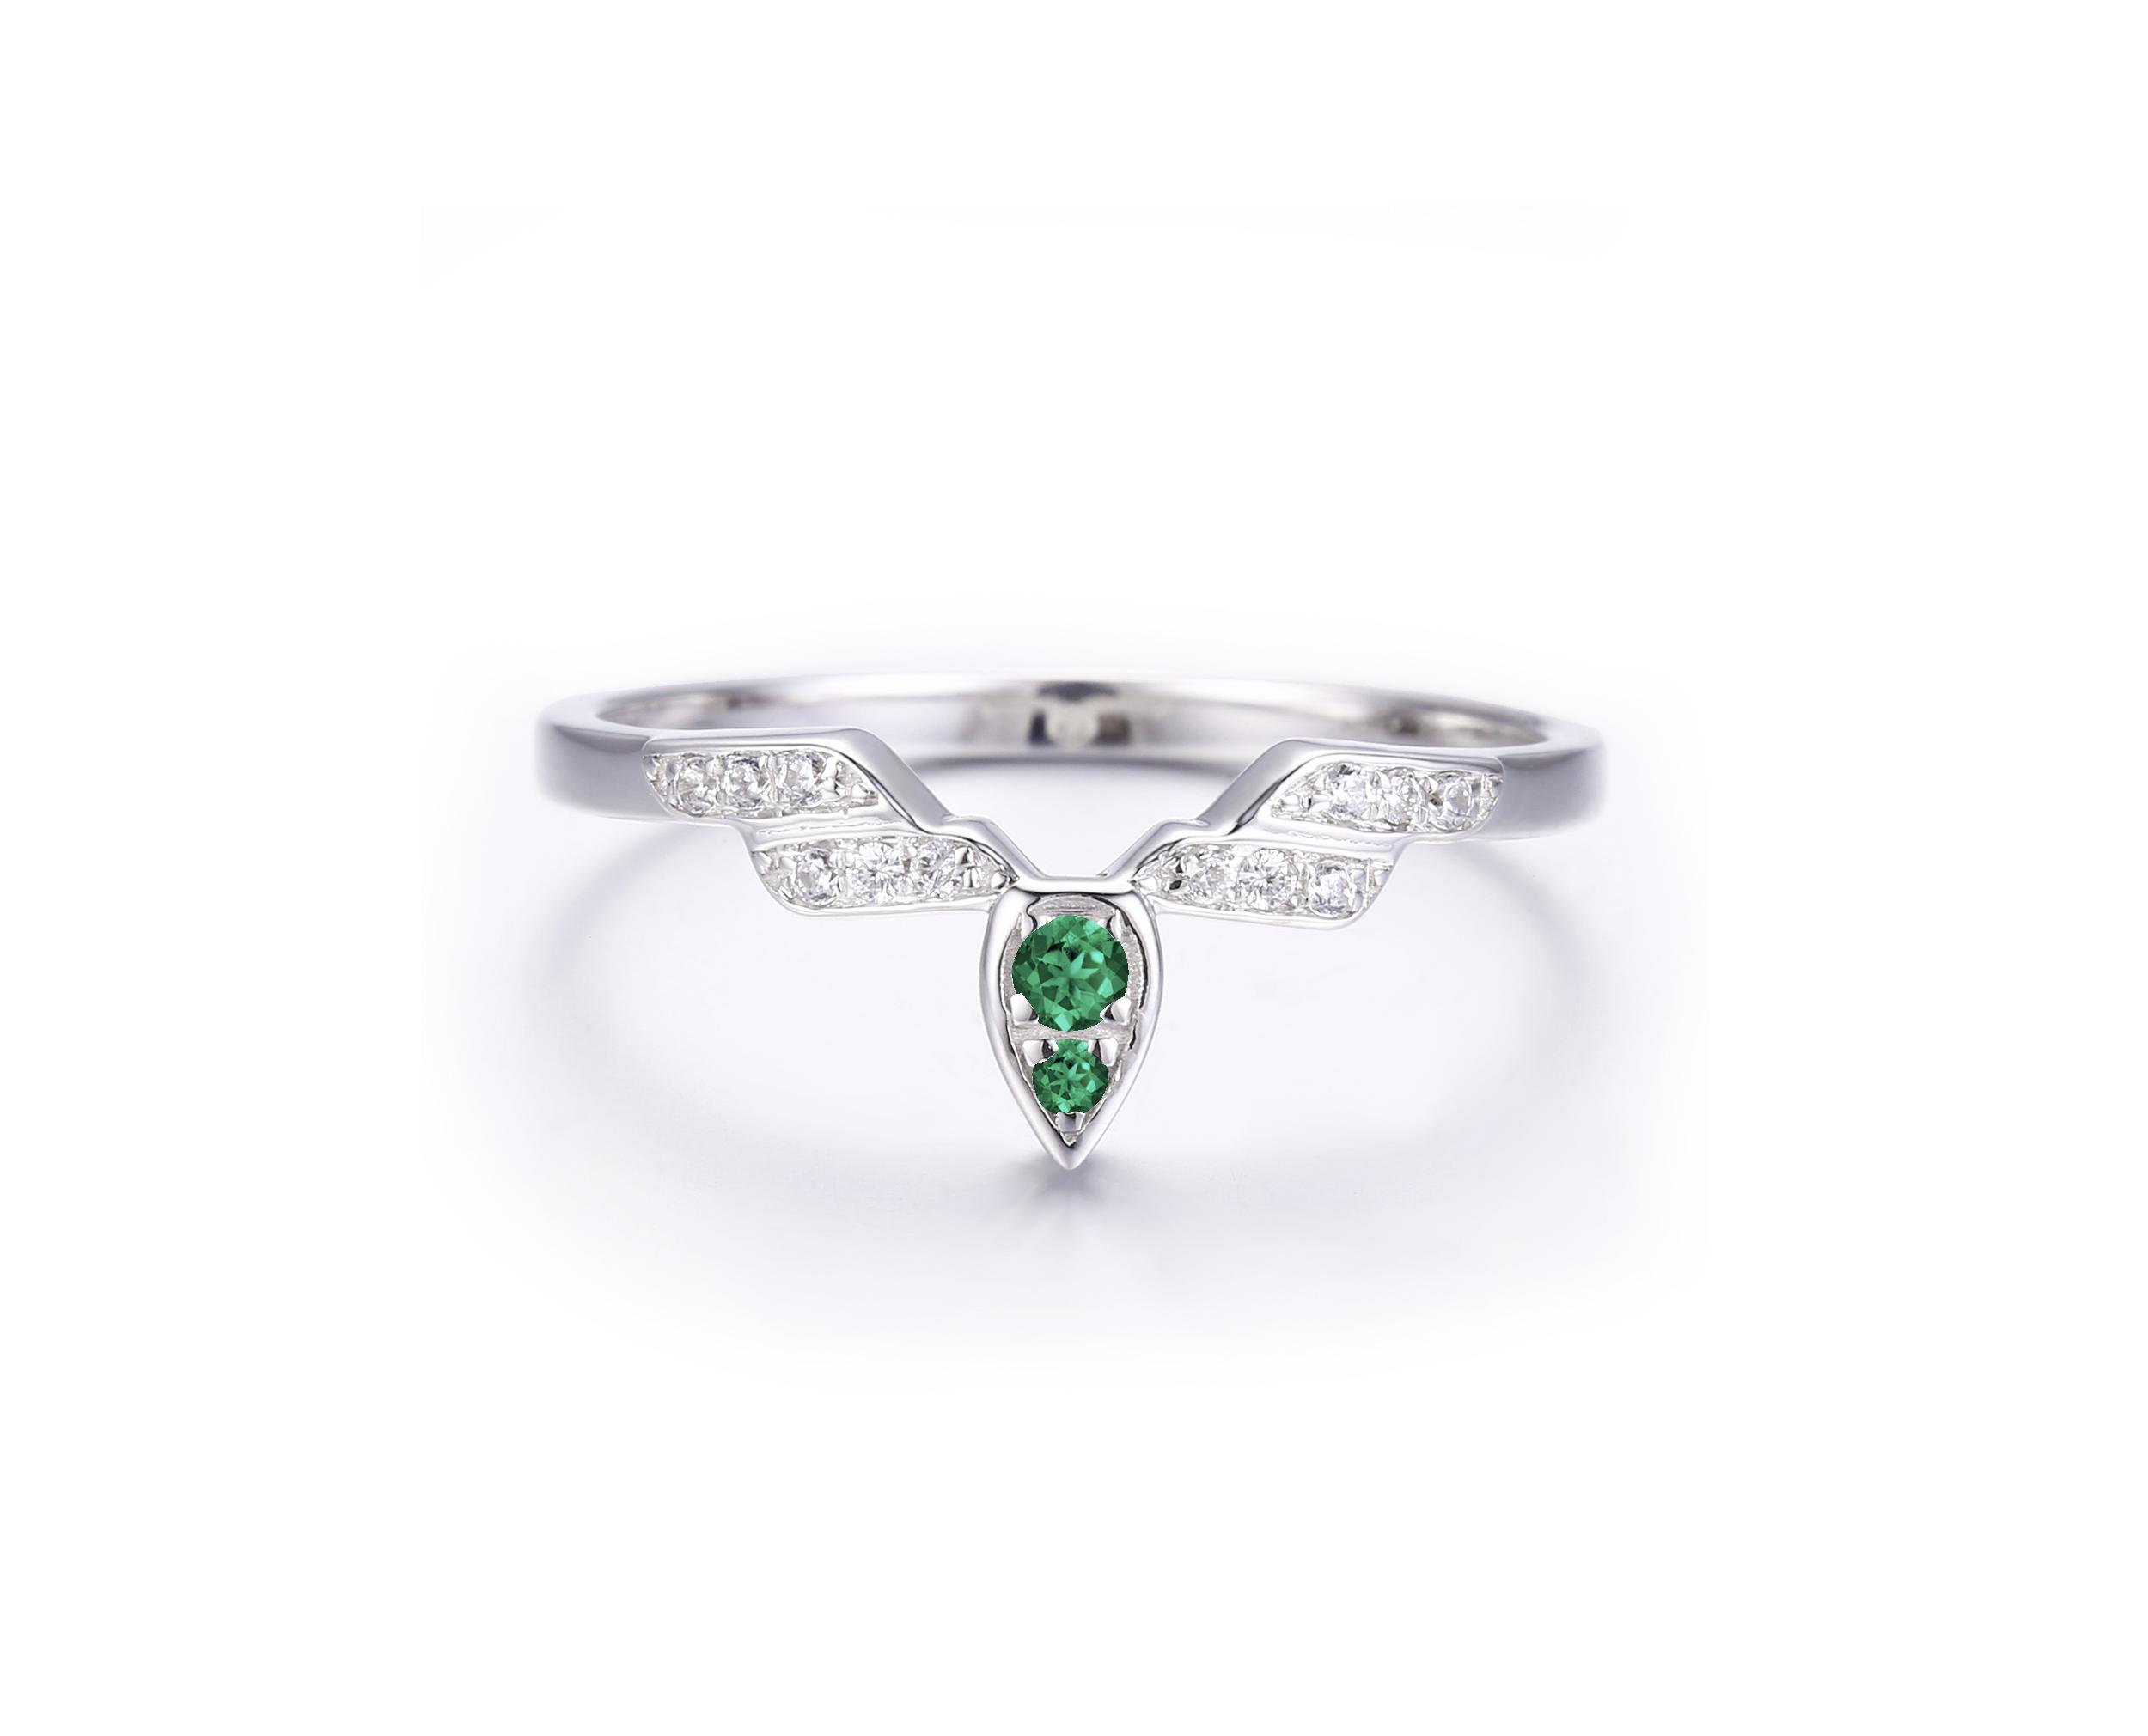 detail-3 - emerald.jpg